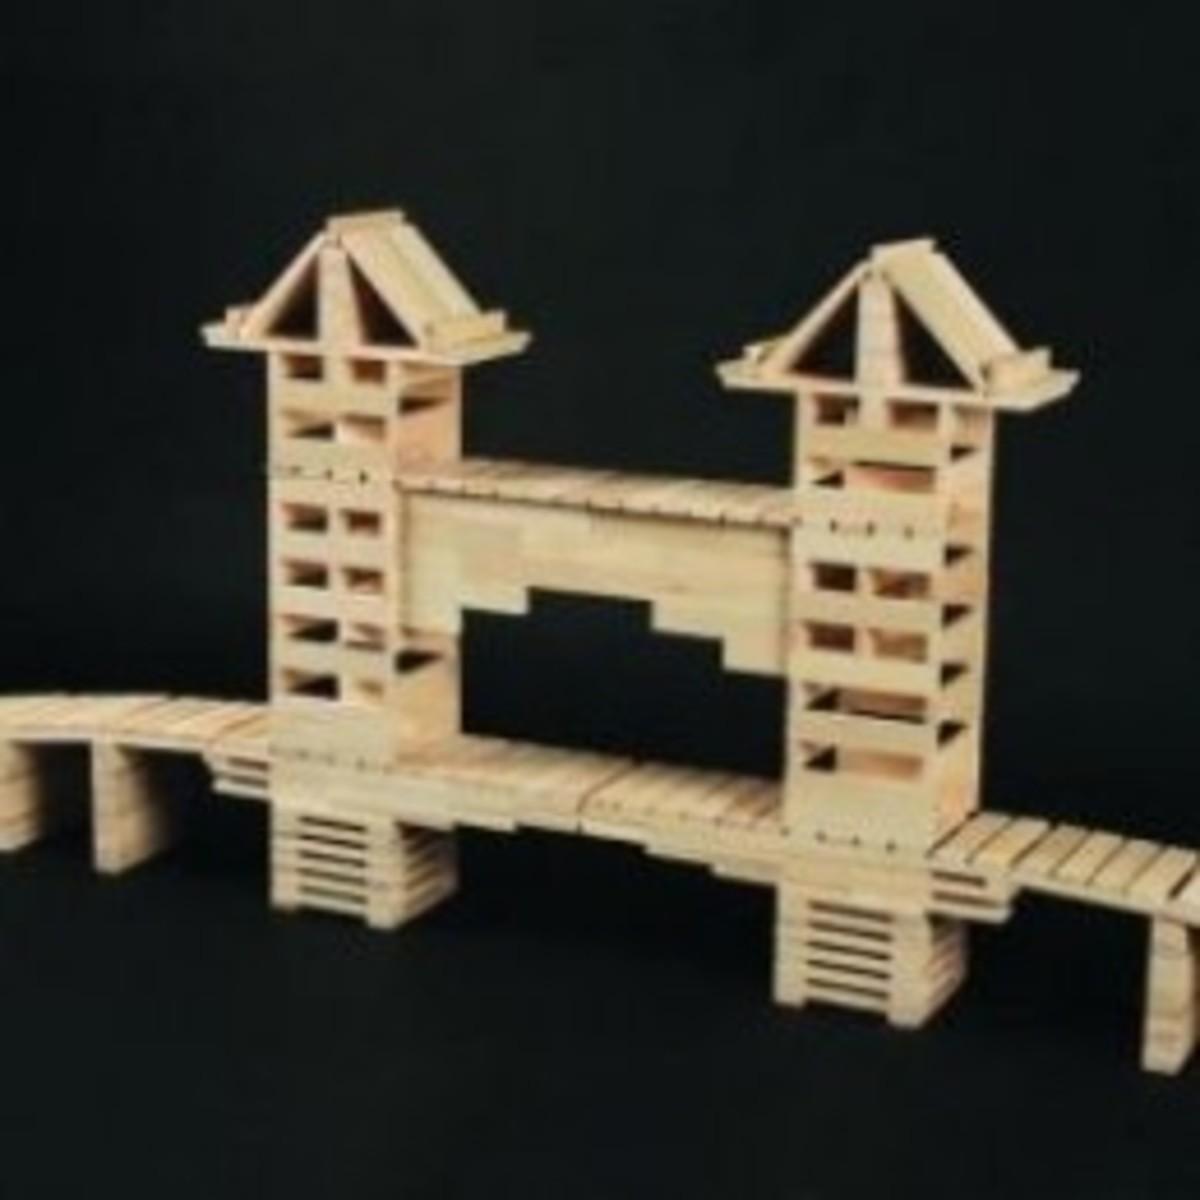 bridge-unit-presentations-and-field-trip-ideas